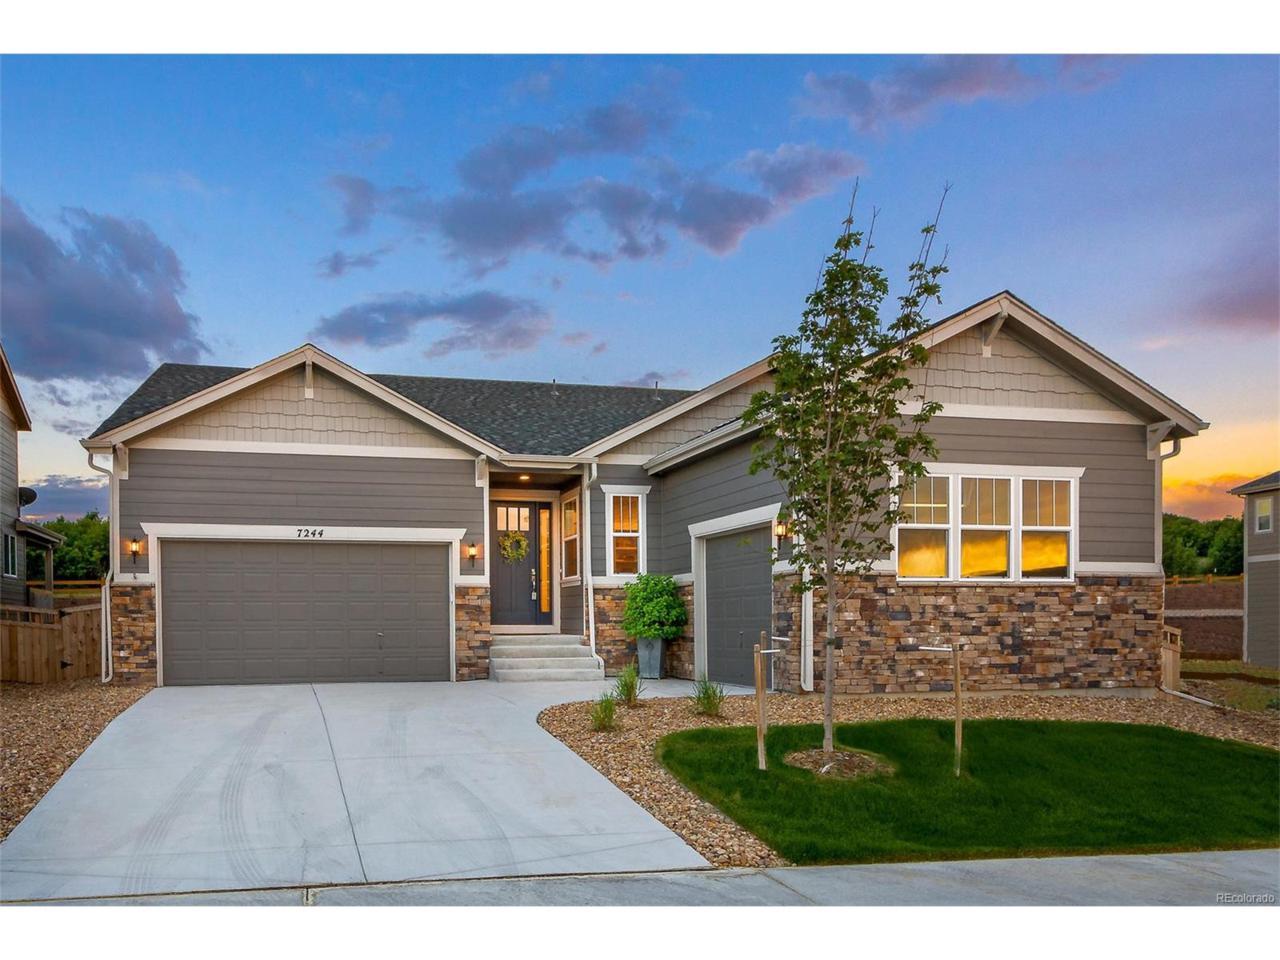 7244 Oasis Drive, Castle Rock, CO 80108 (MLS #2656104) :: 8z Real Estate